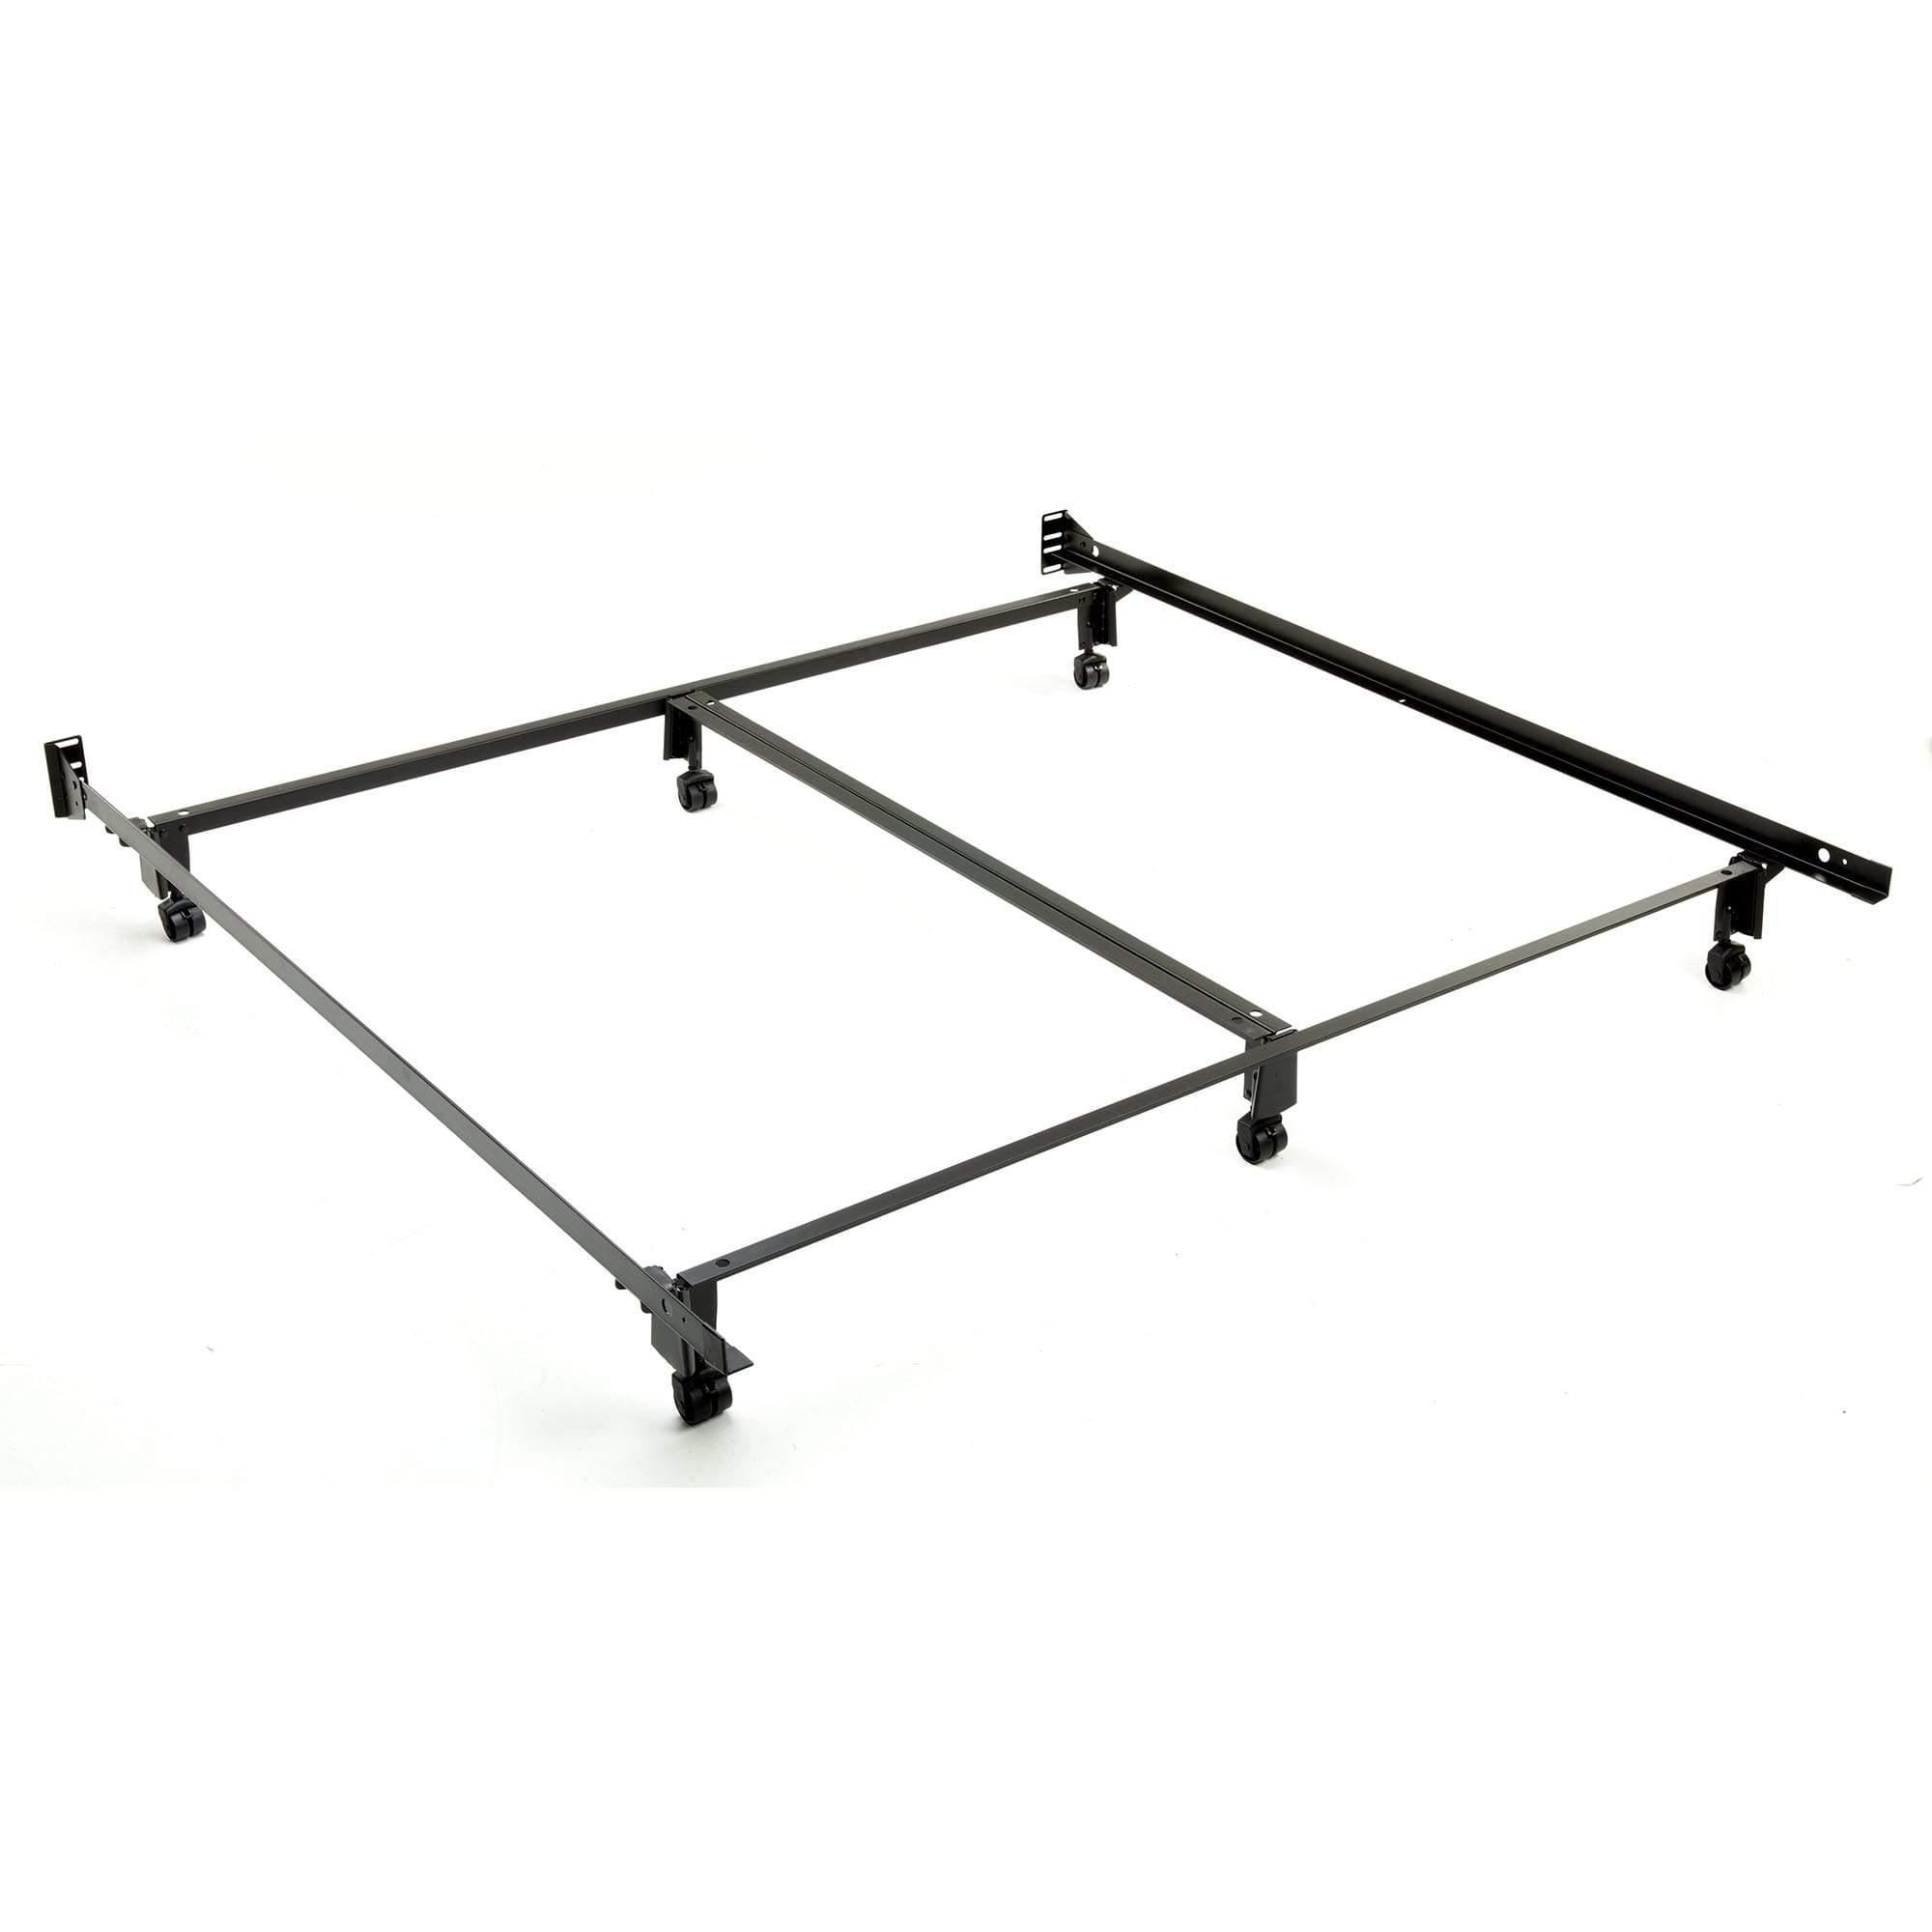 Inst A Matic Premium 777r Bed Frame W Headboard Brackets 6 2